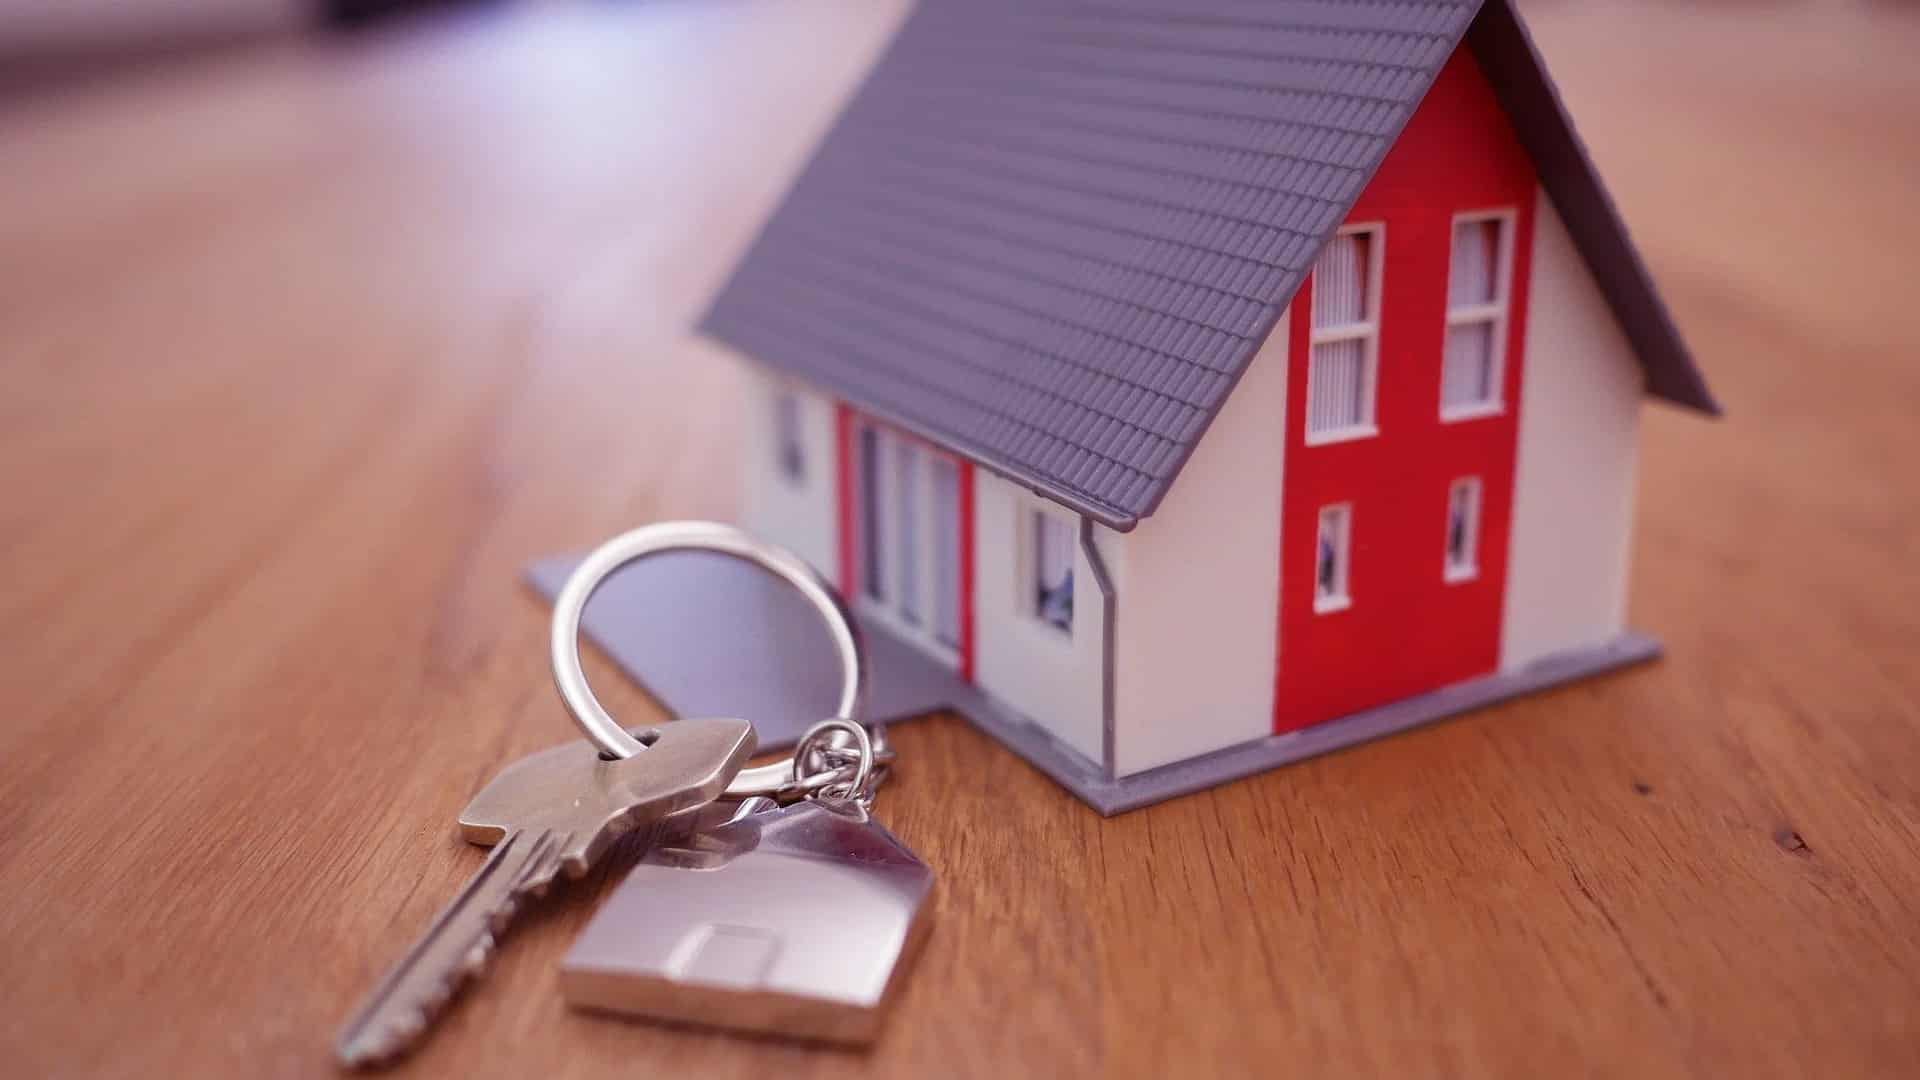 Sundaram Home Finance seeks to raise Rs 2,500 cr to fund growt plans